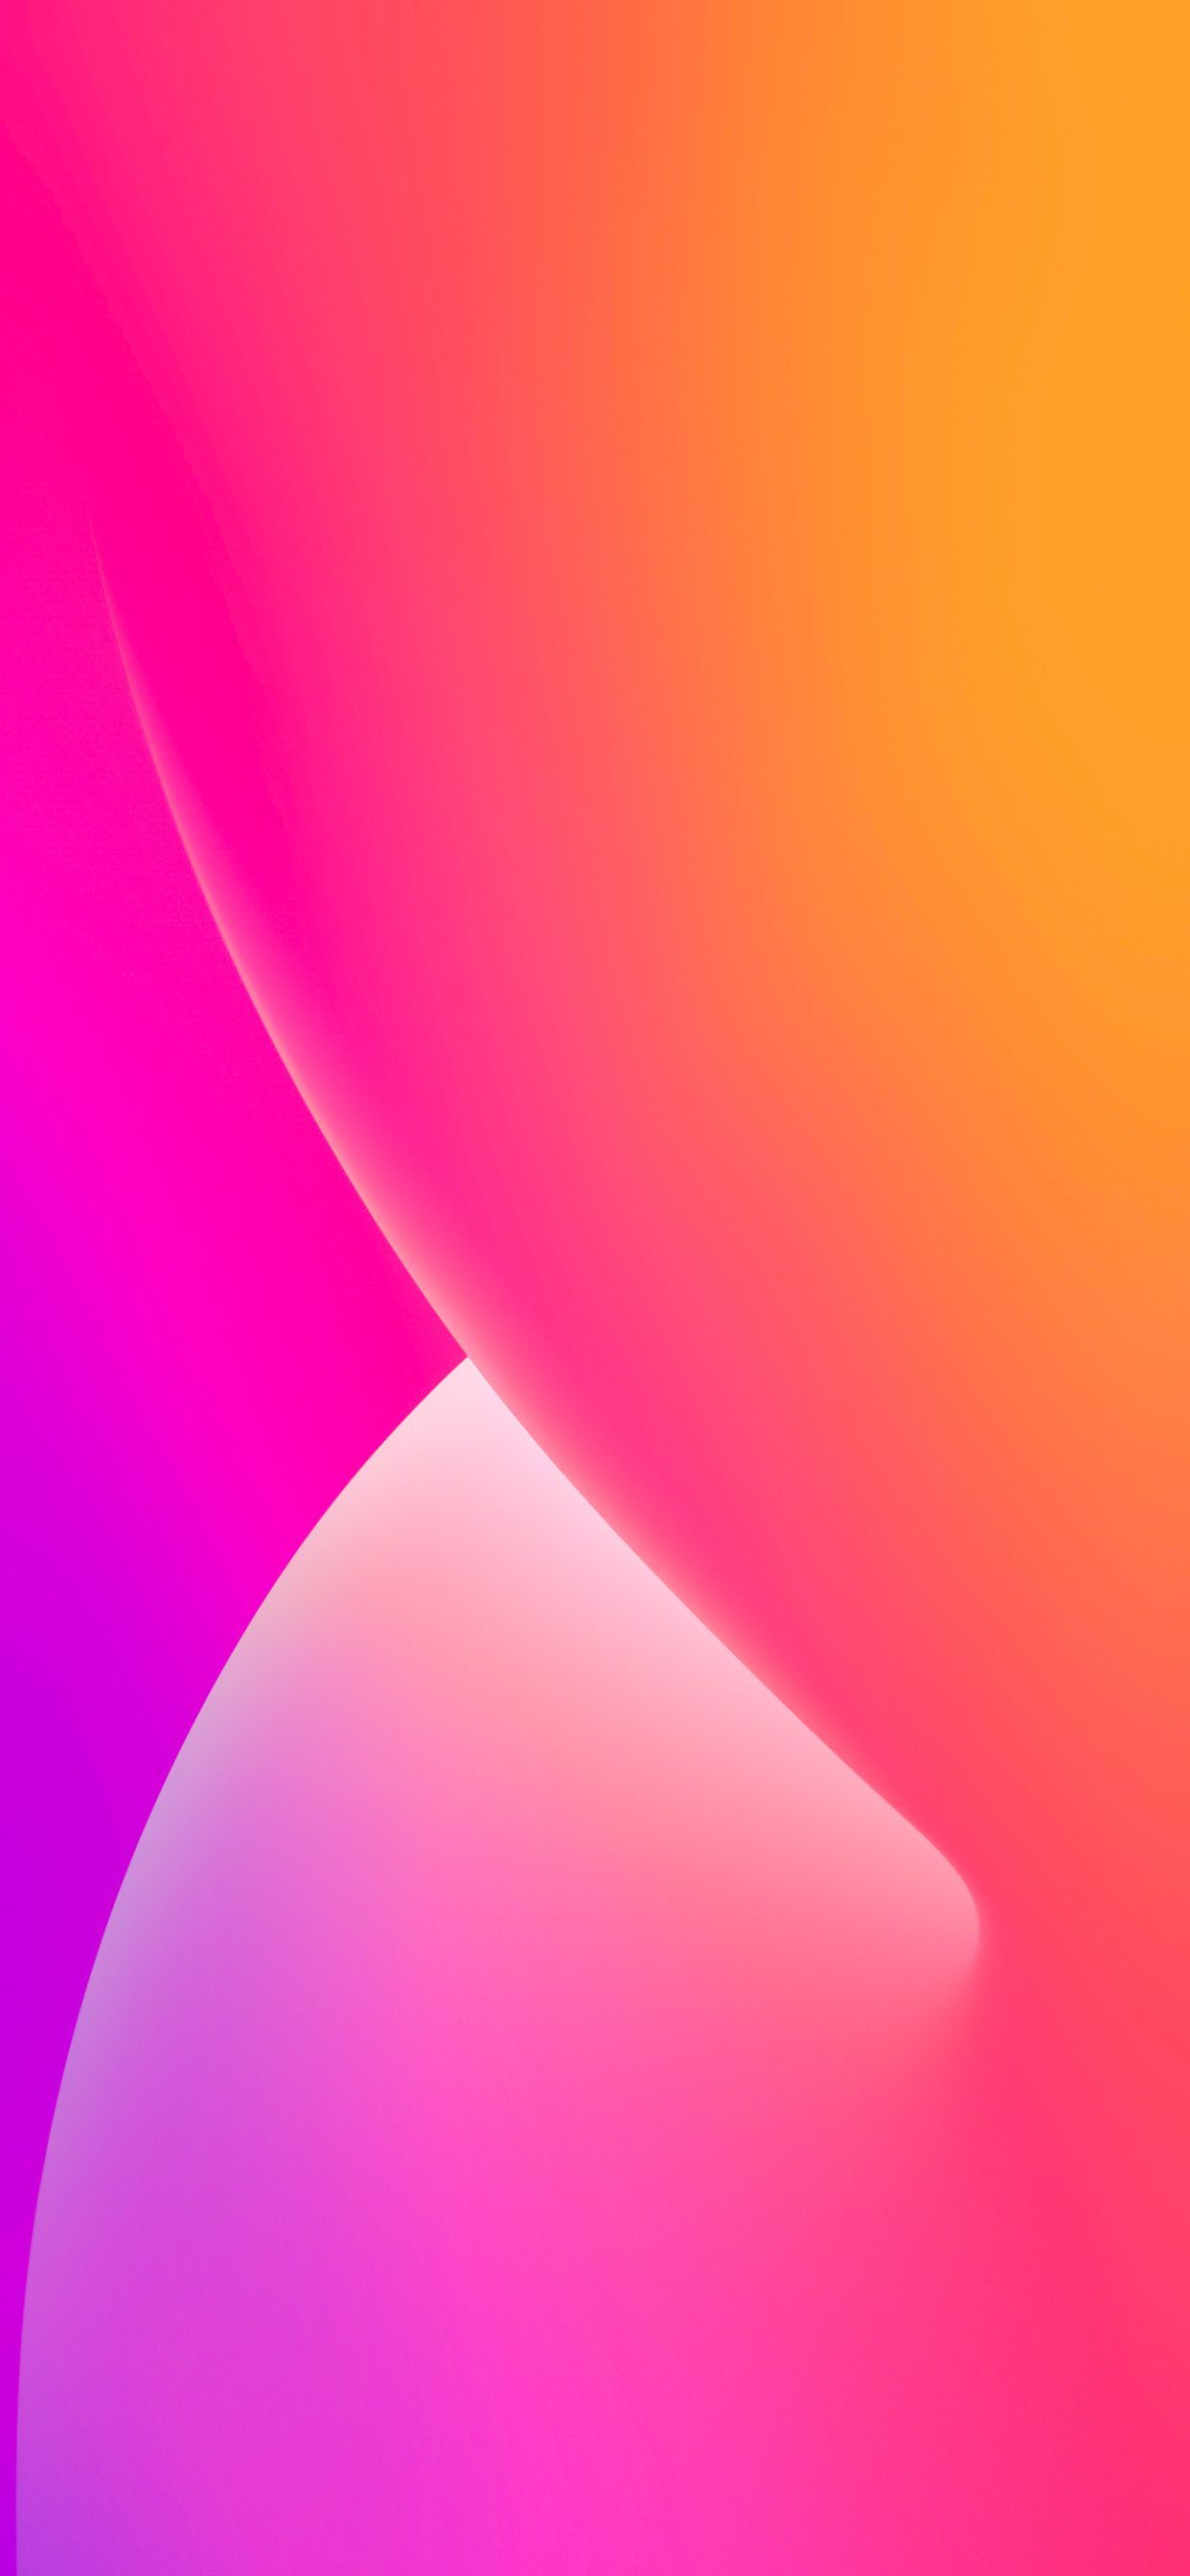 Ios 14 Fondo De Pantalla Apple Wallpaper Iphone Colourful Wallpaper Iphone Iphone Homescreen Wallpaper